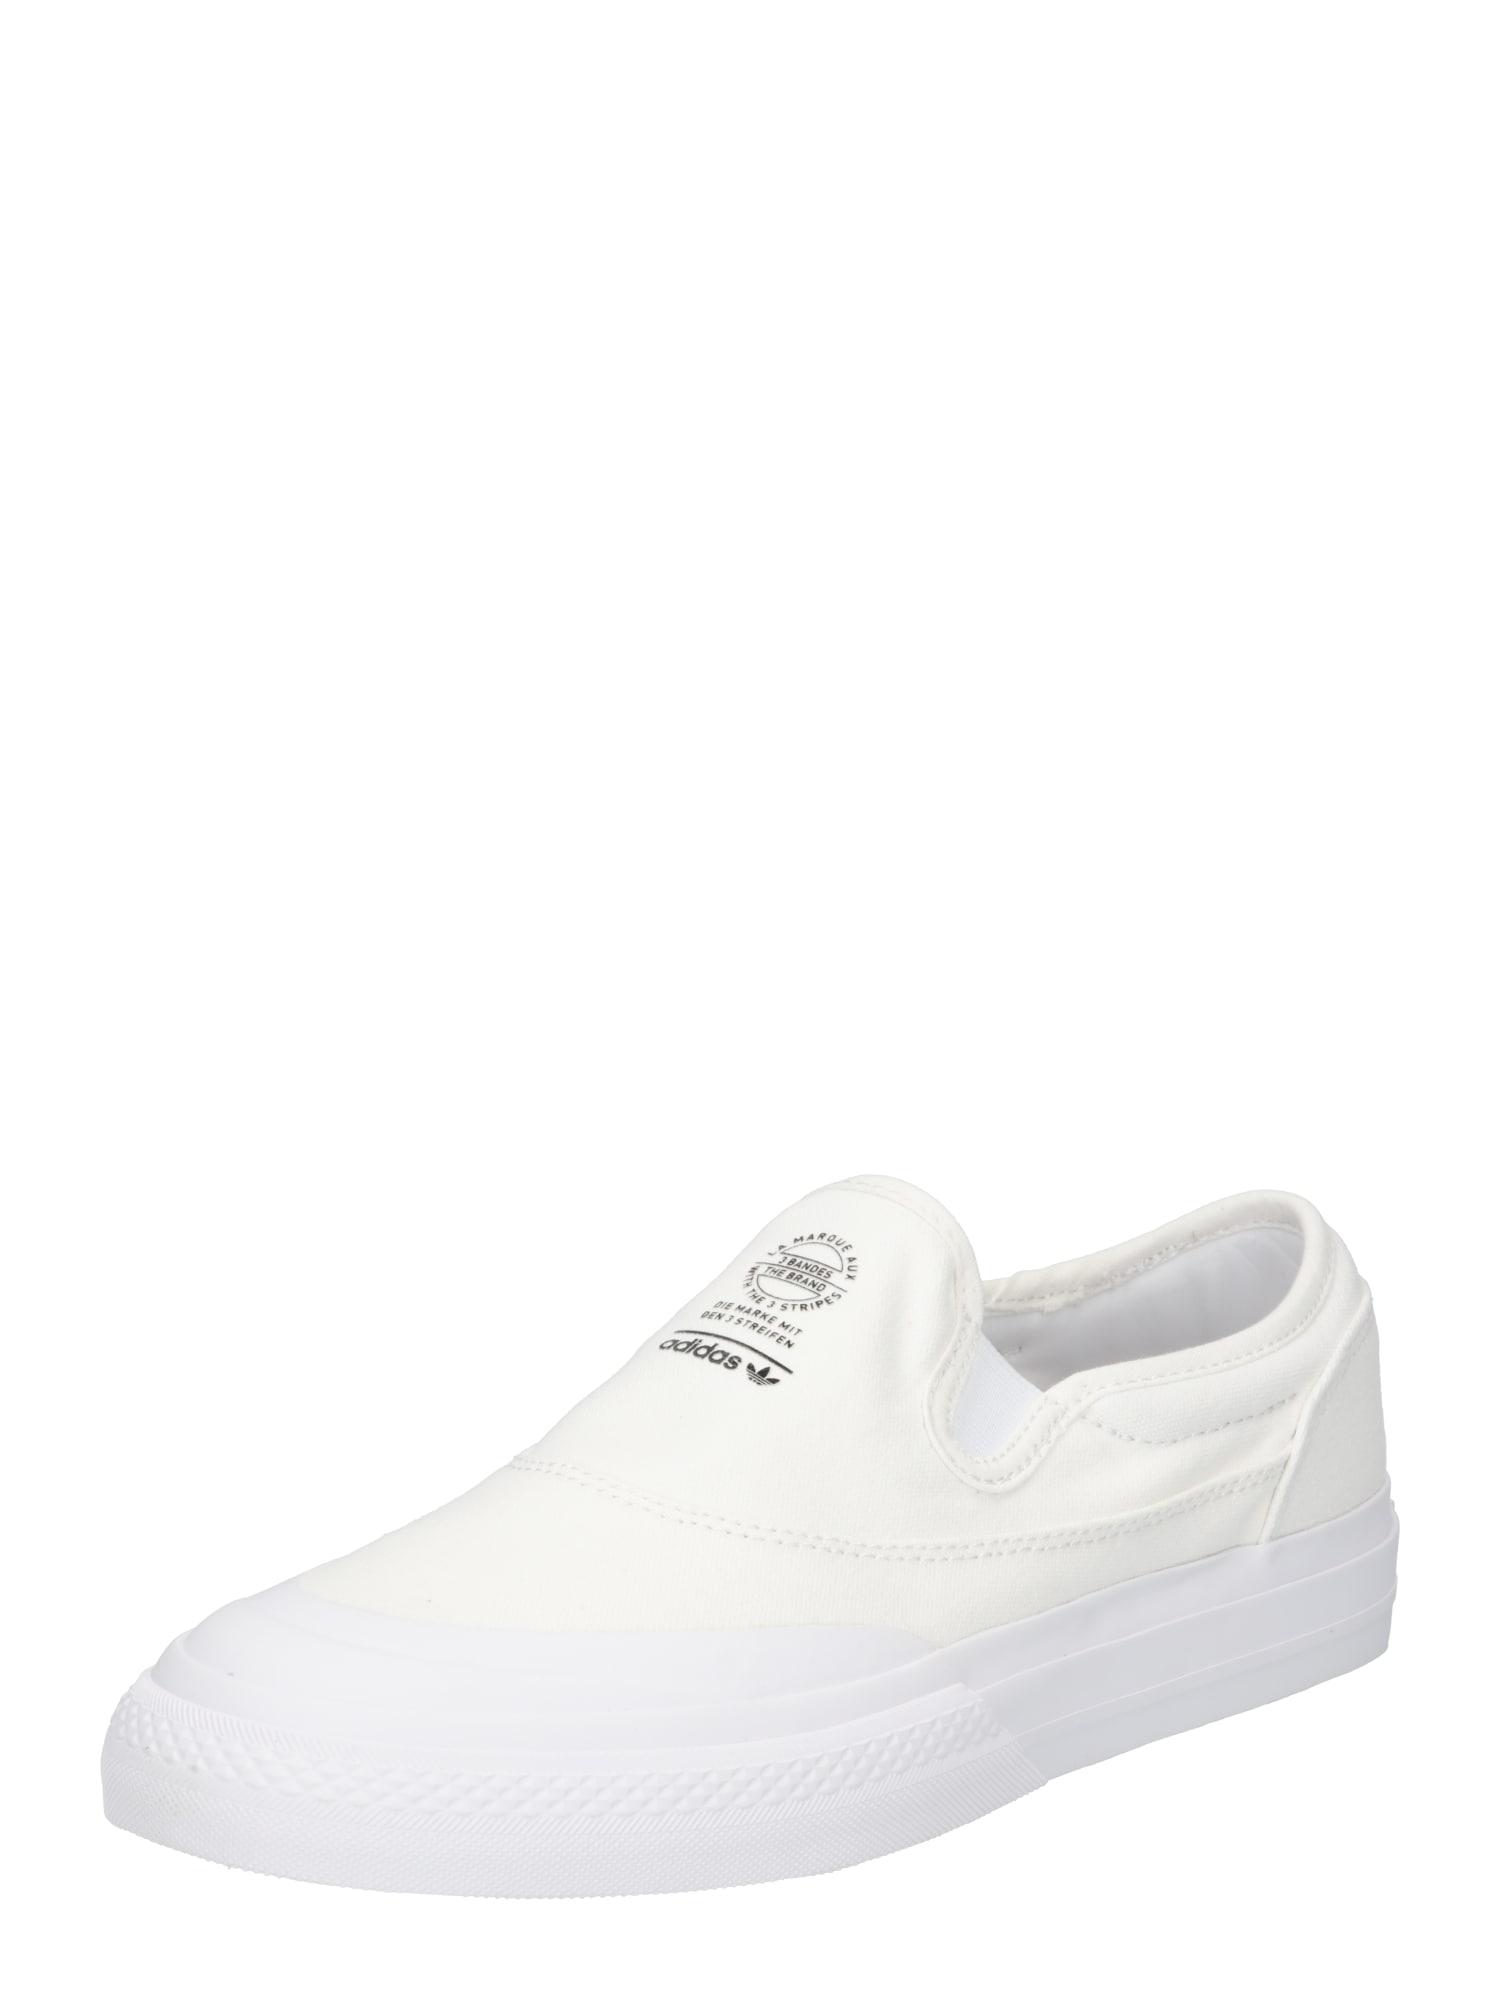 adidas originals scarpa slip-on 'nizza' bianco